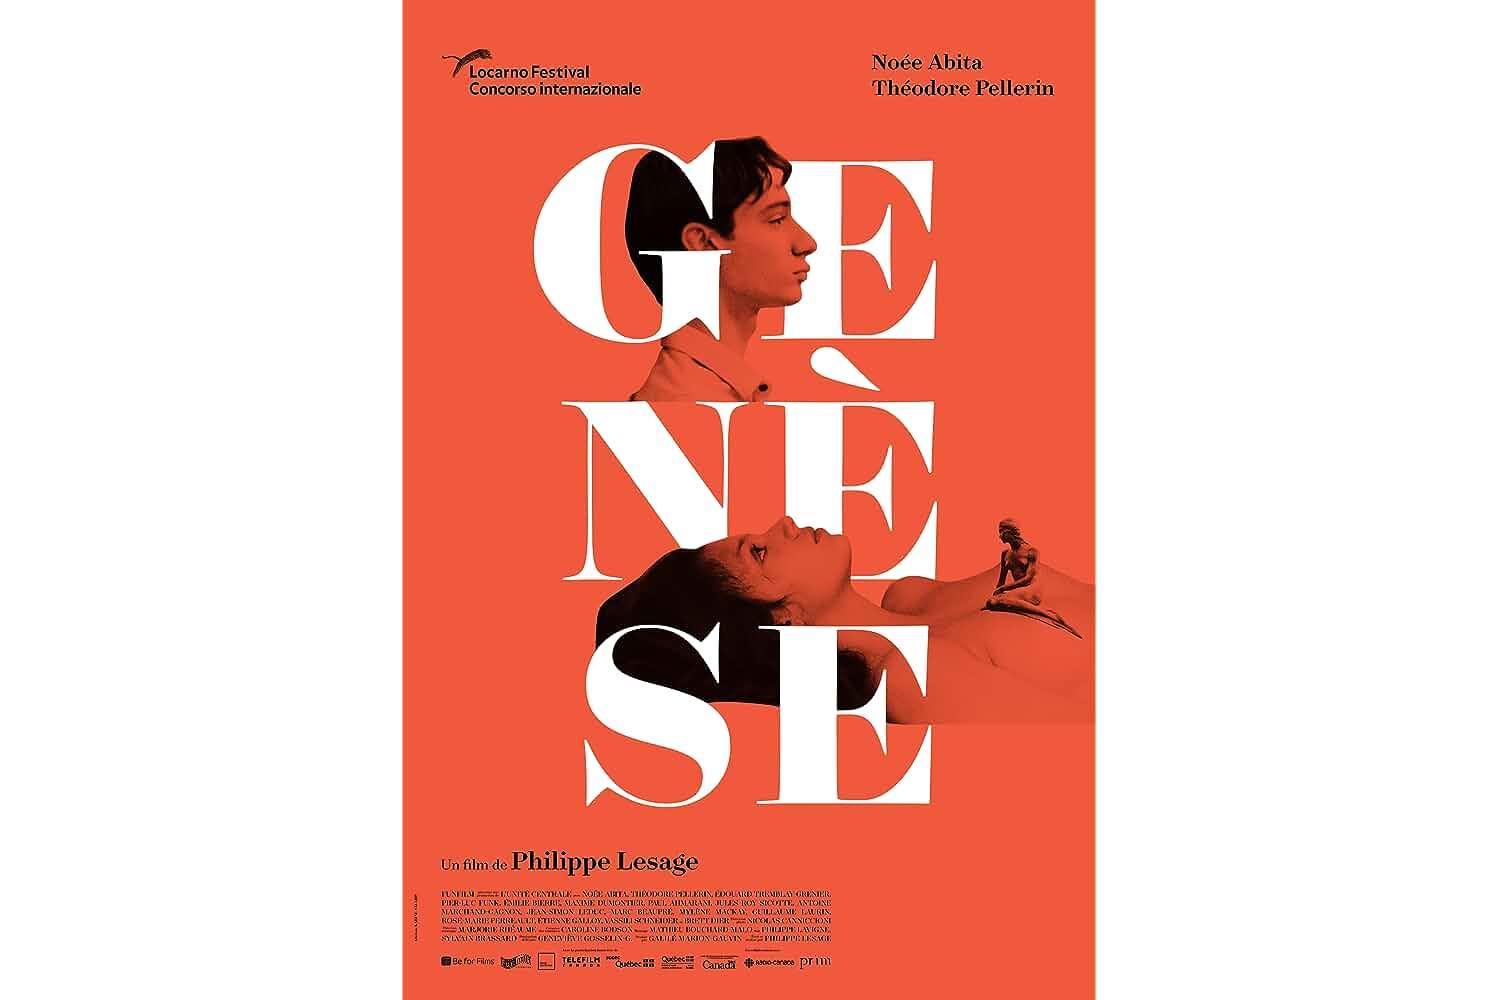 Gense (2018)